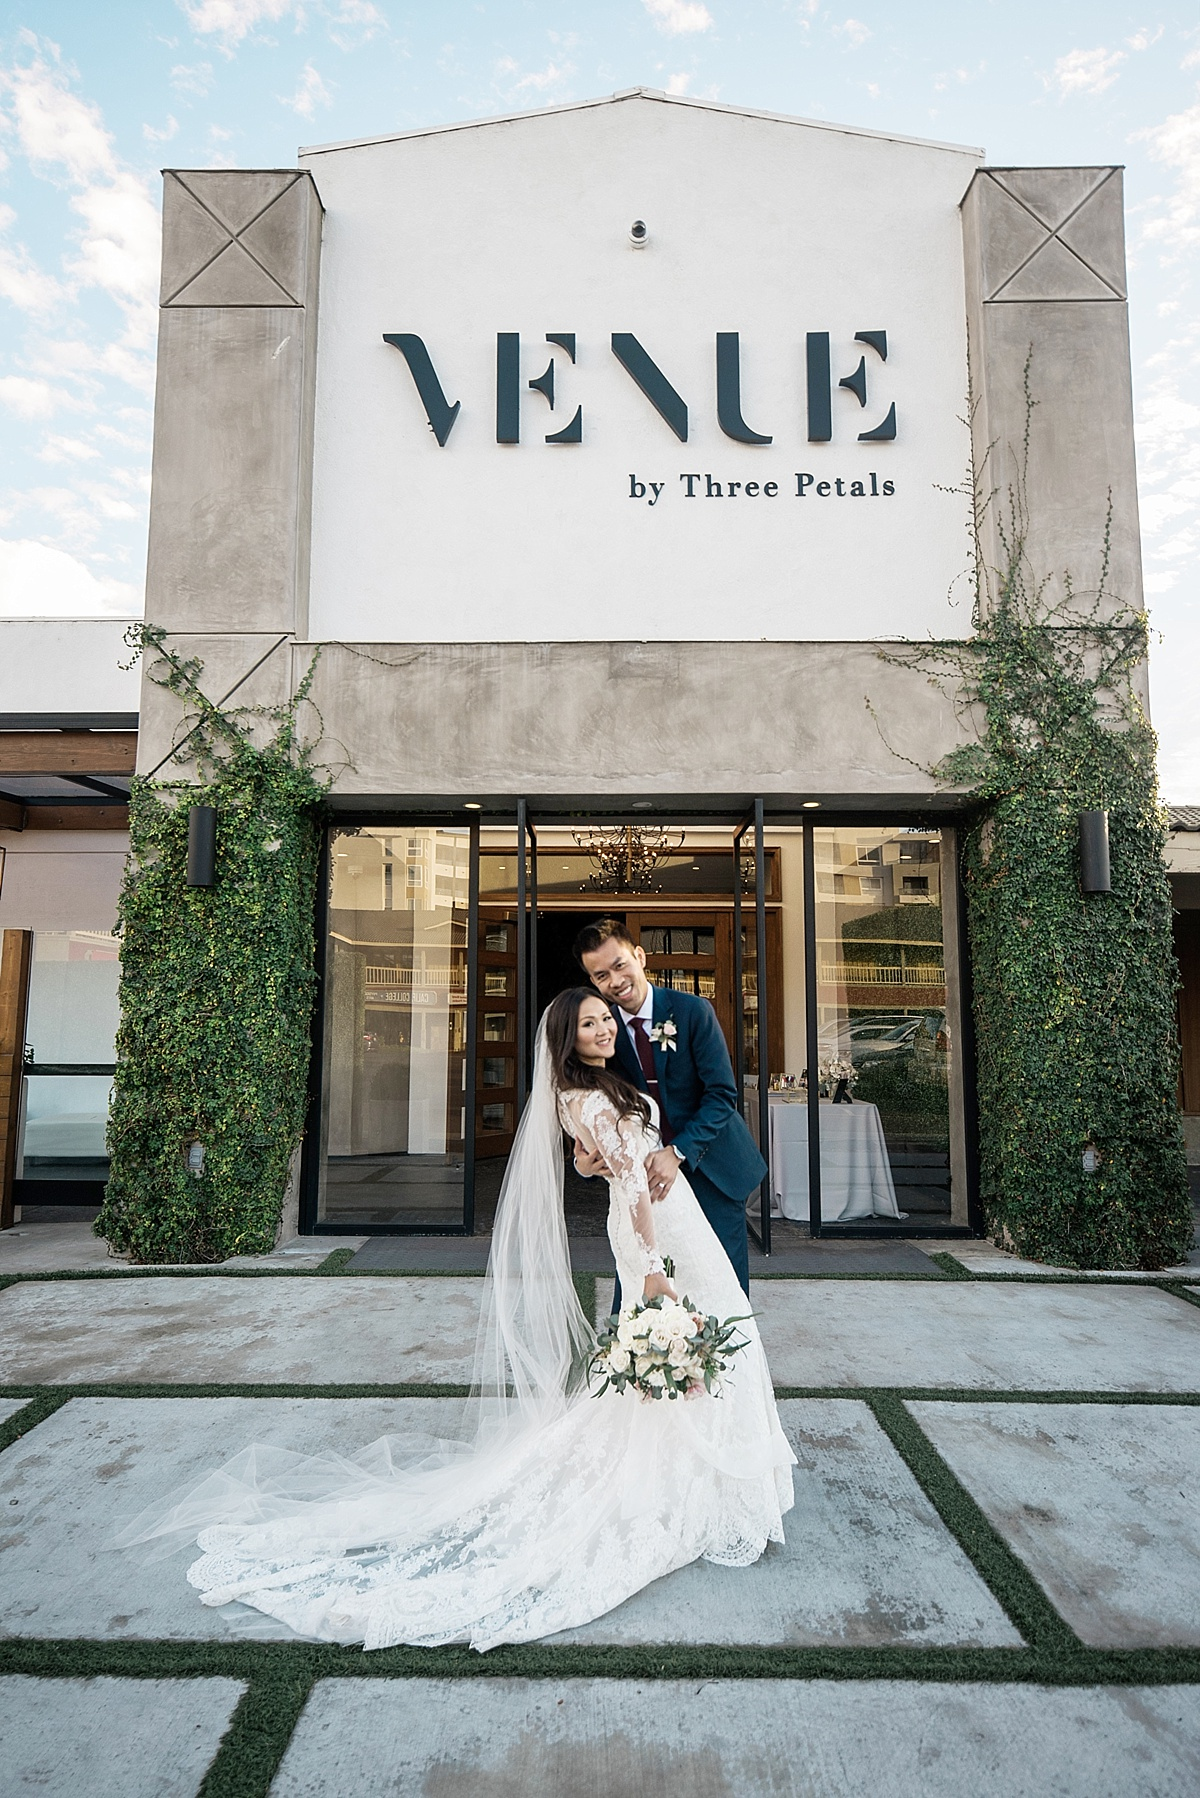 The-Venue-ByThree-Petals-Huntington-Beach-Wedding-Photographer-Christine-Andrew-Carissa-Woo-Photography_0086.jpg